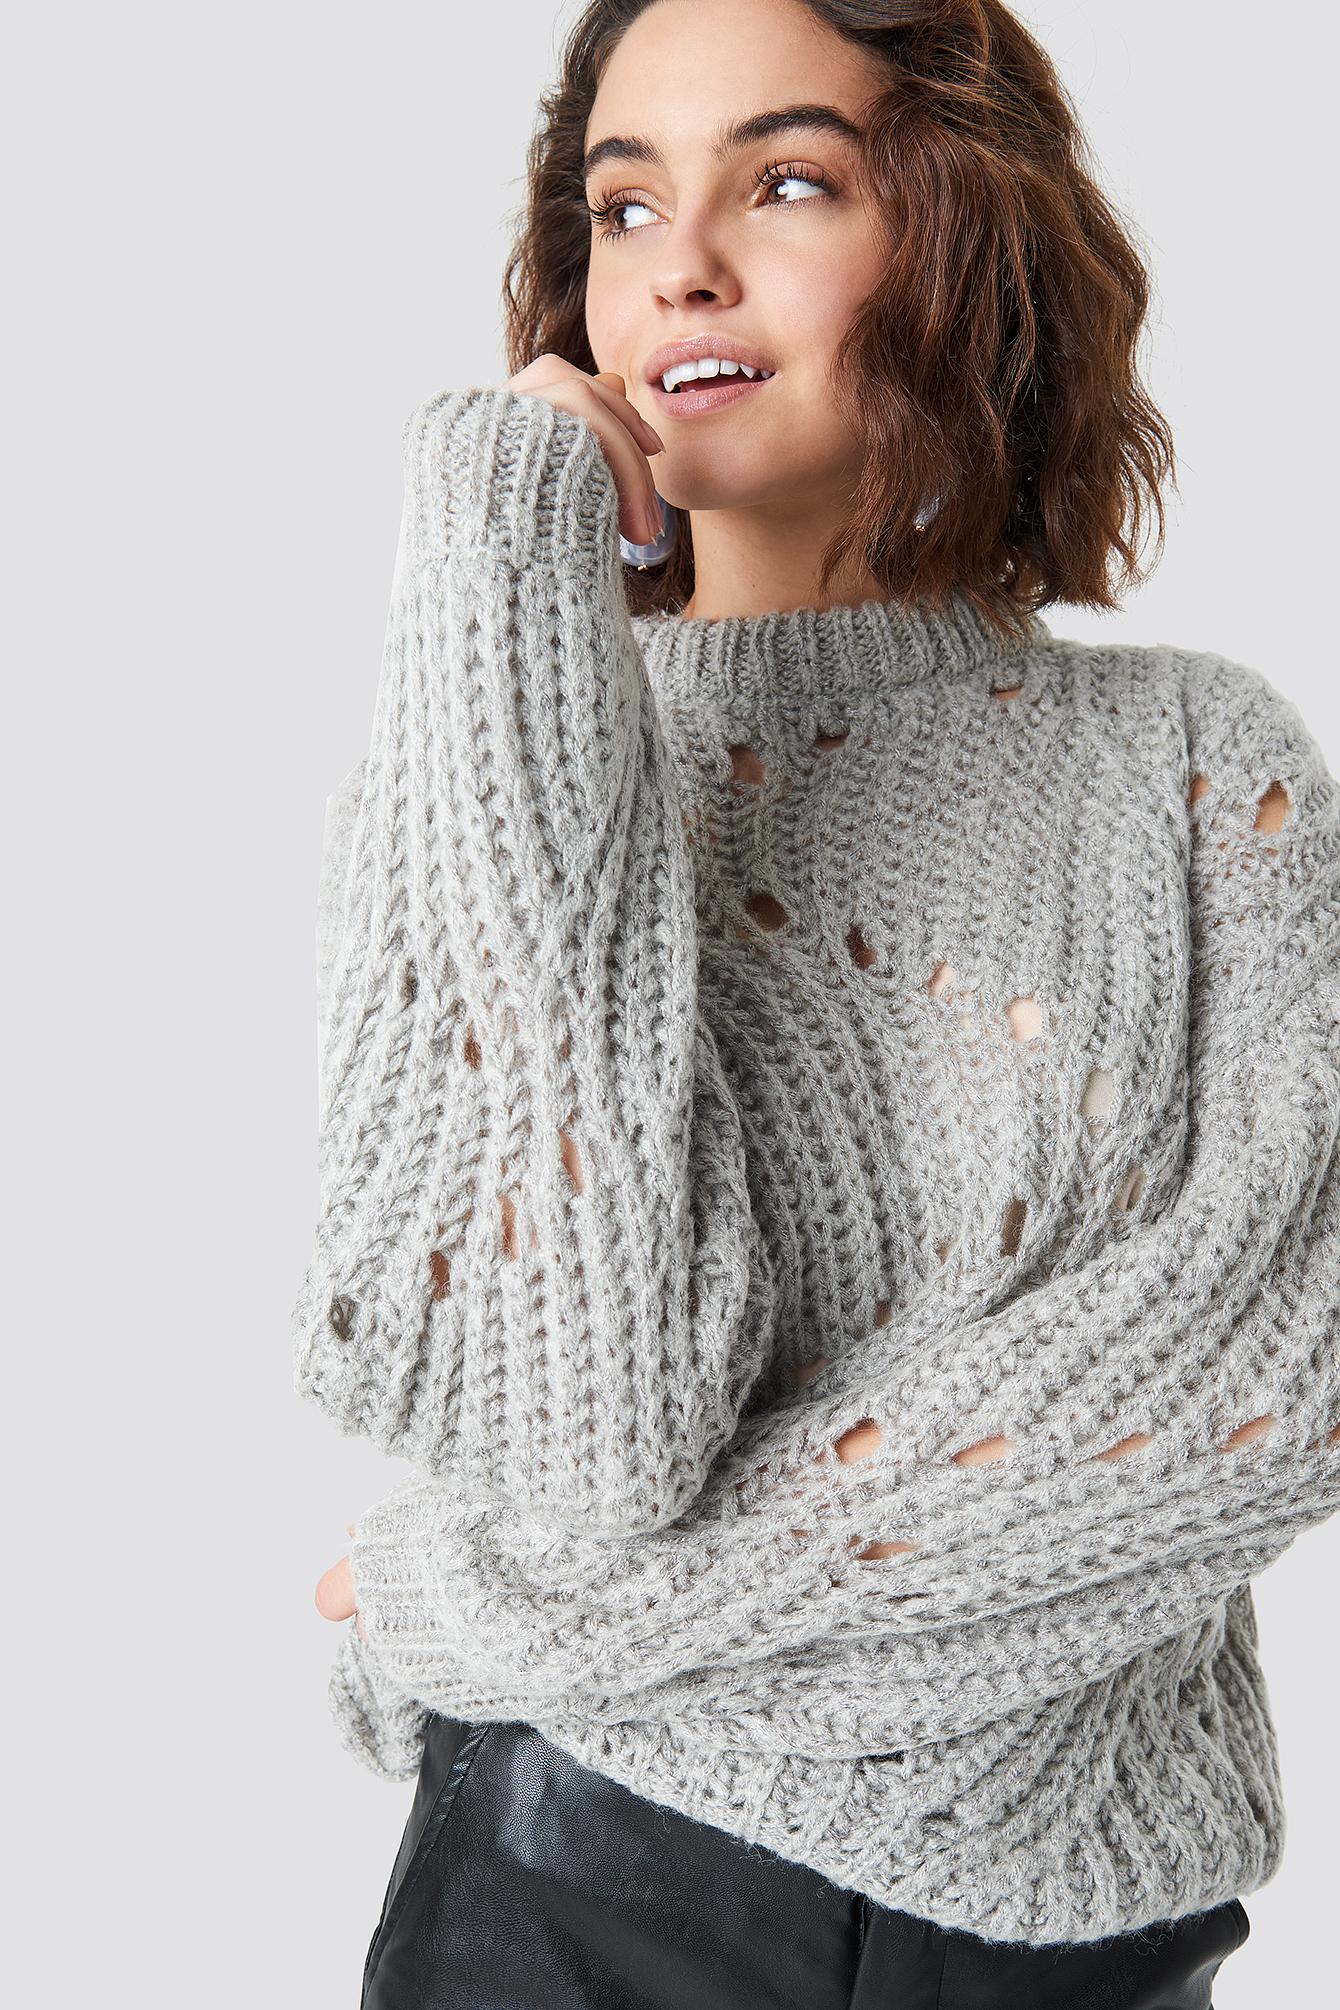 MOVES Fiolina Sweater - Grey